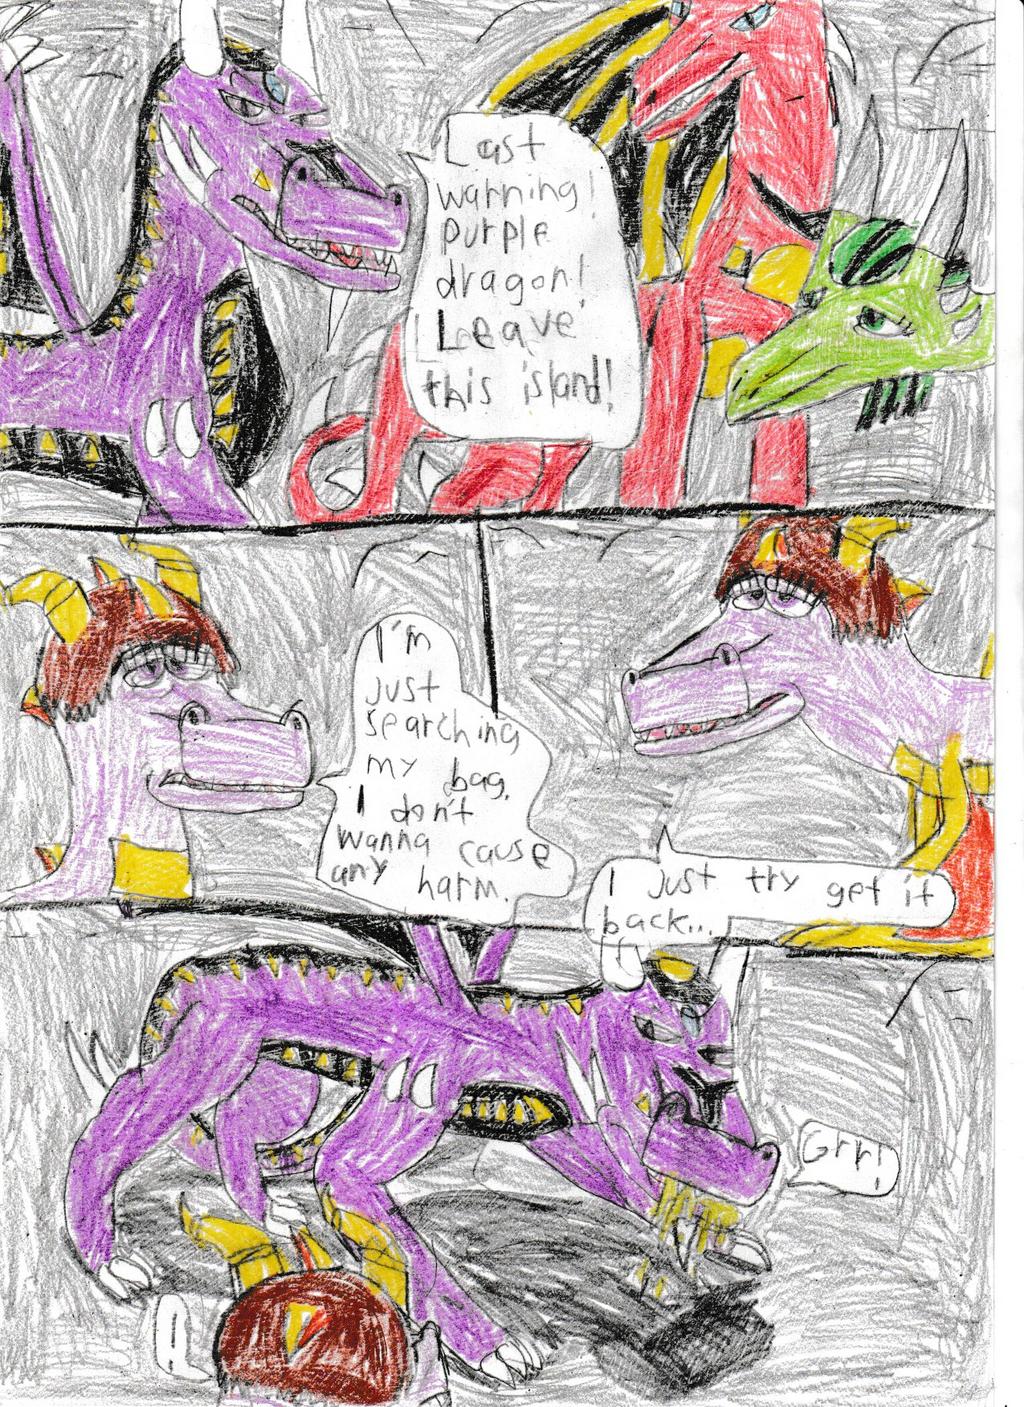 Legend of dragon: Outcast:Pg 92